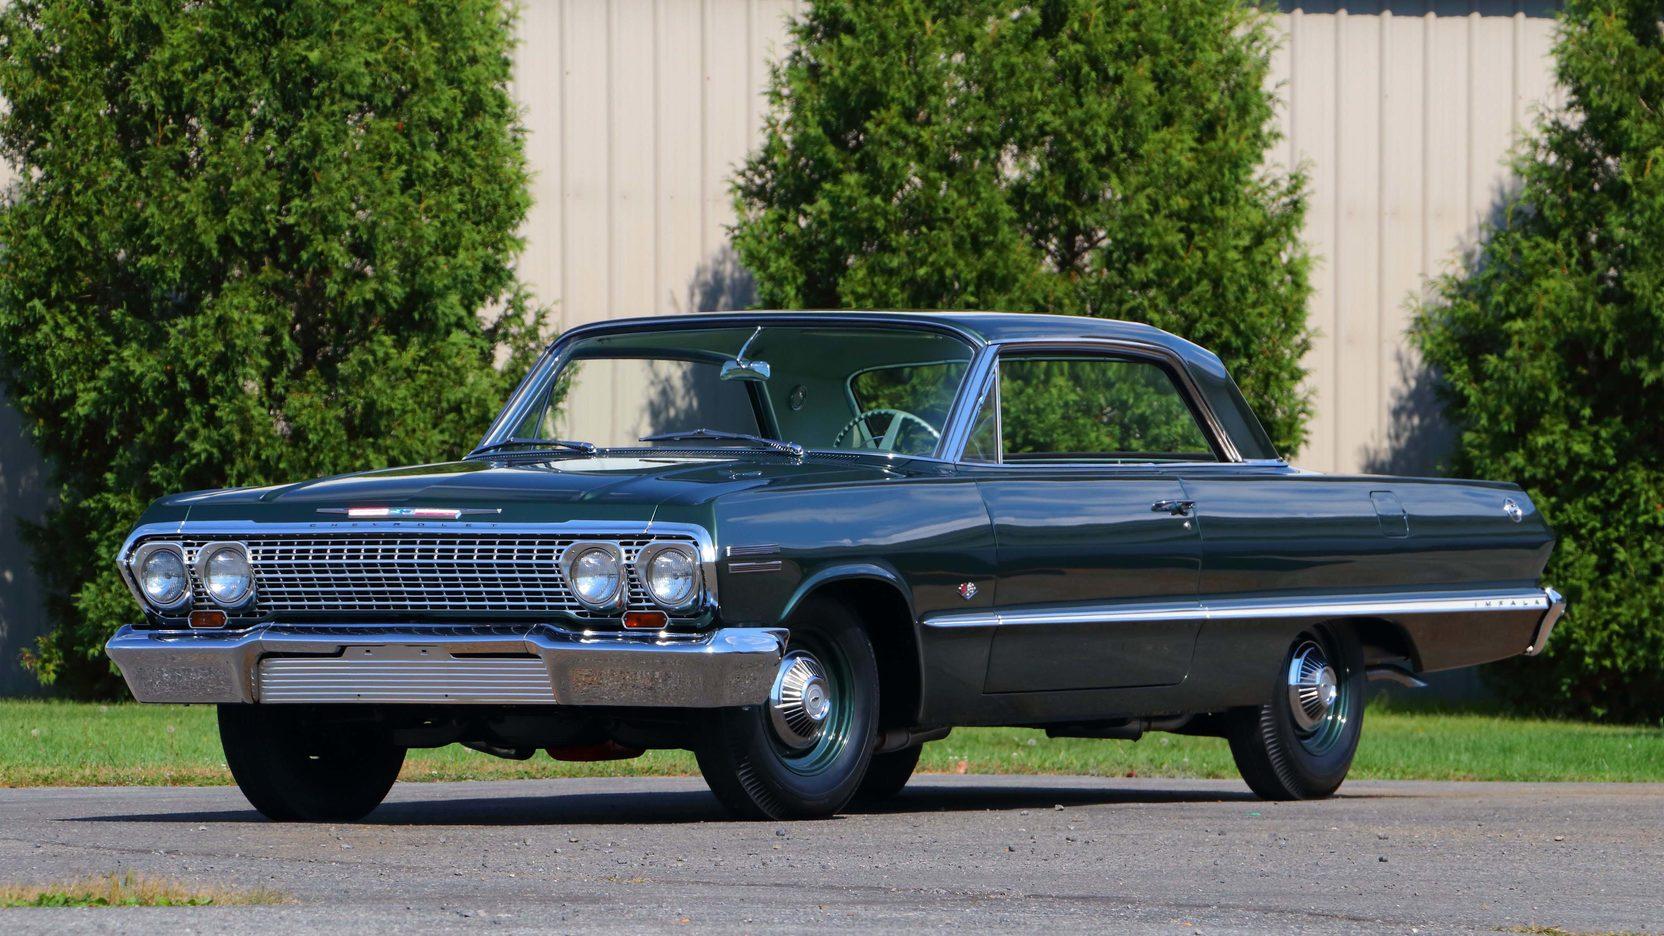 1963 Chevrolet Impala front 3/4